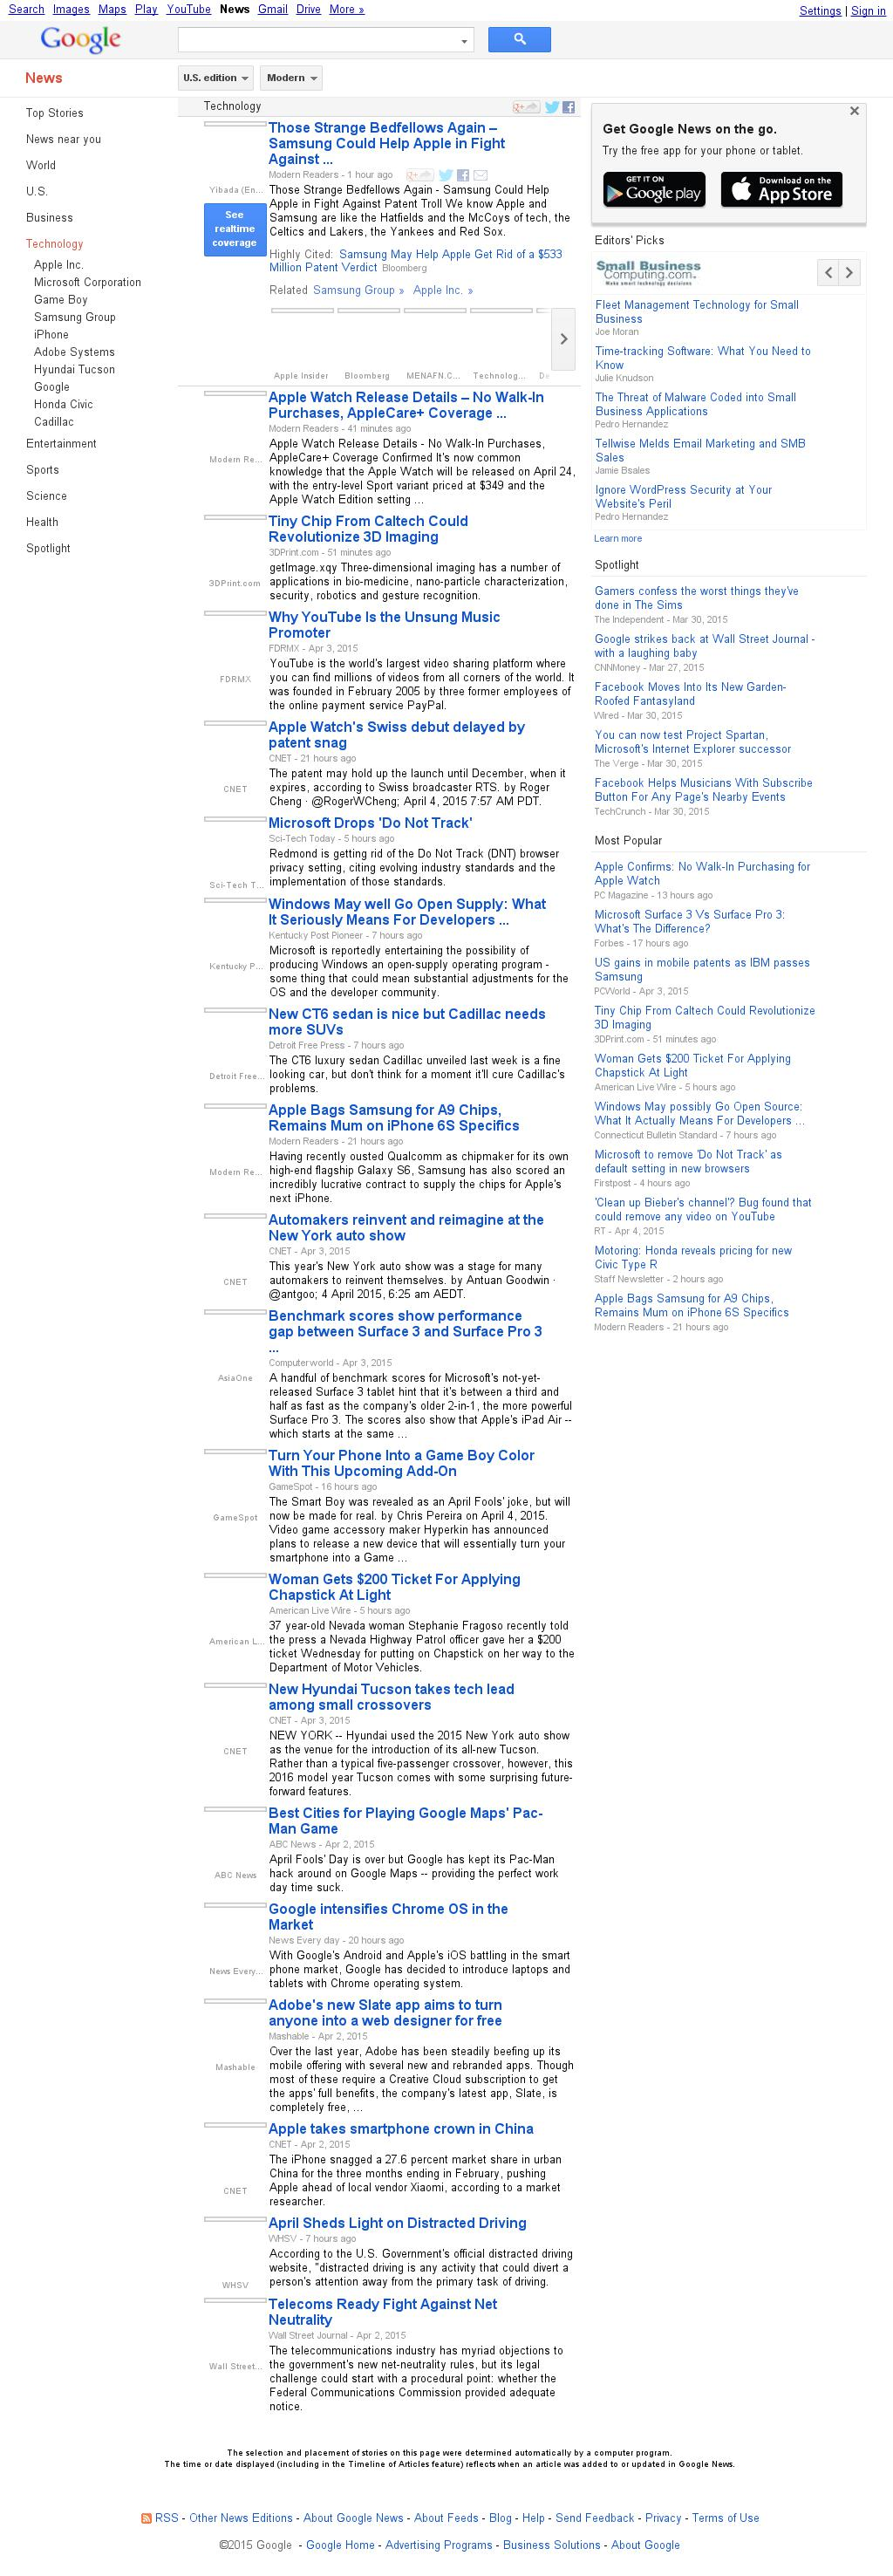 Google News: Technology at Sunday April 5, 2015, 12:10 p.m. UTC